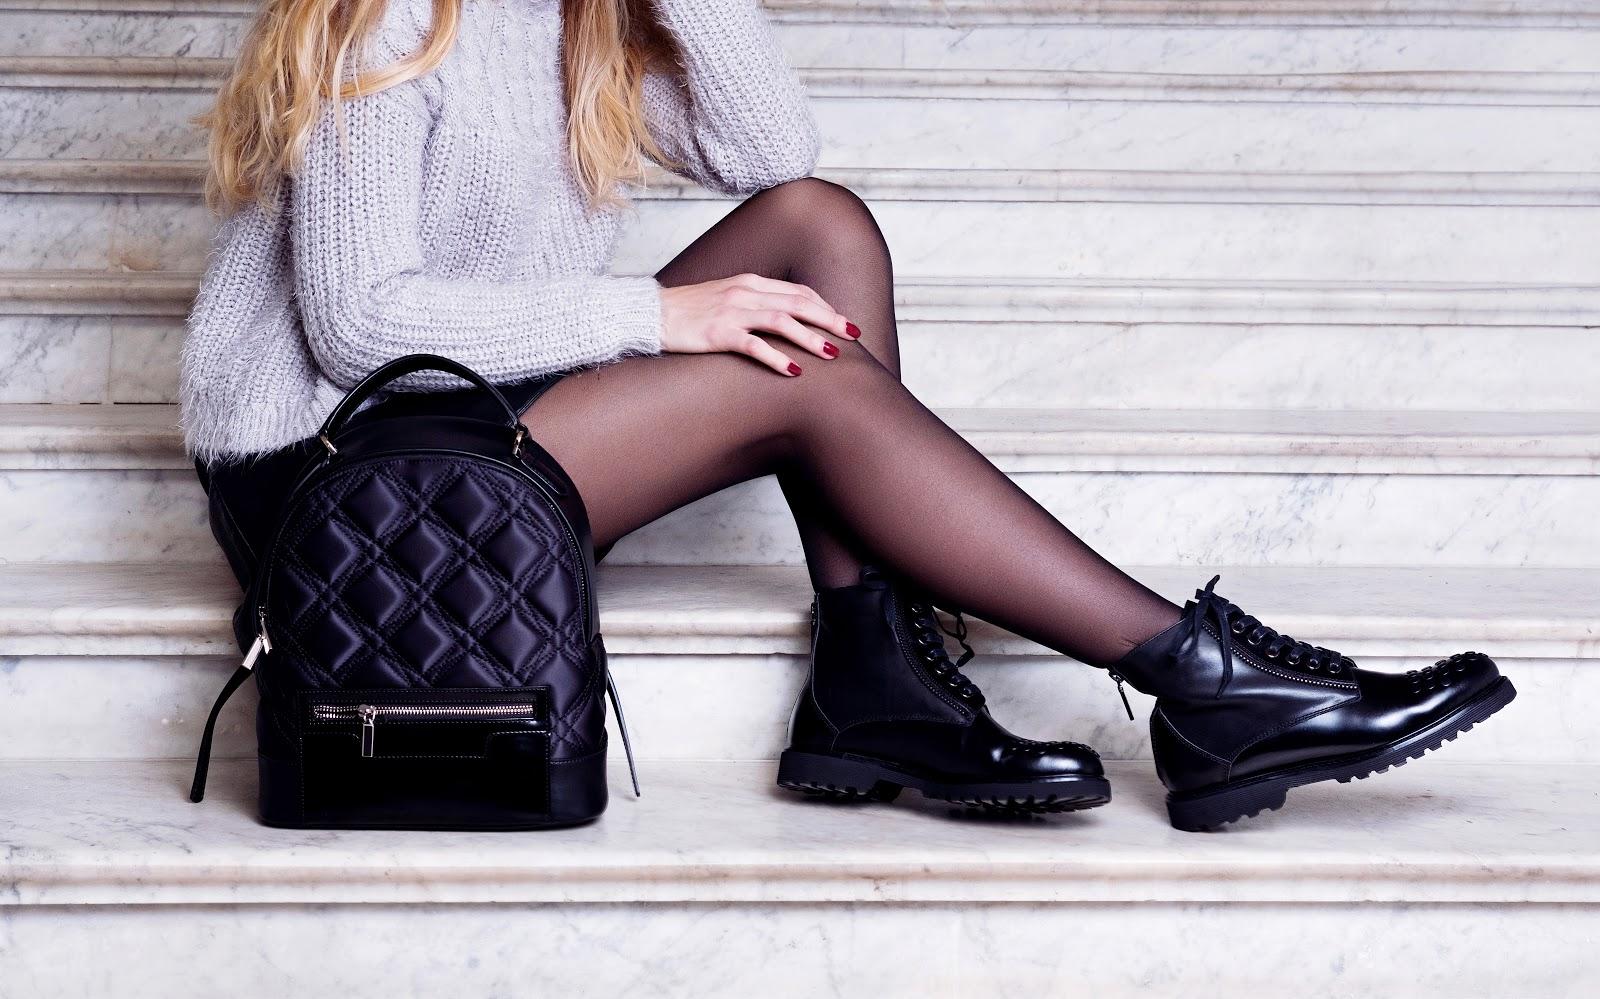 bag shoes boots winter